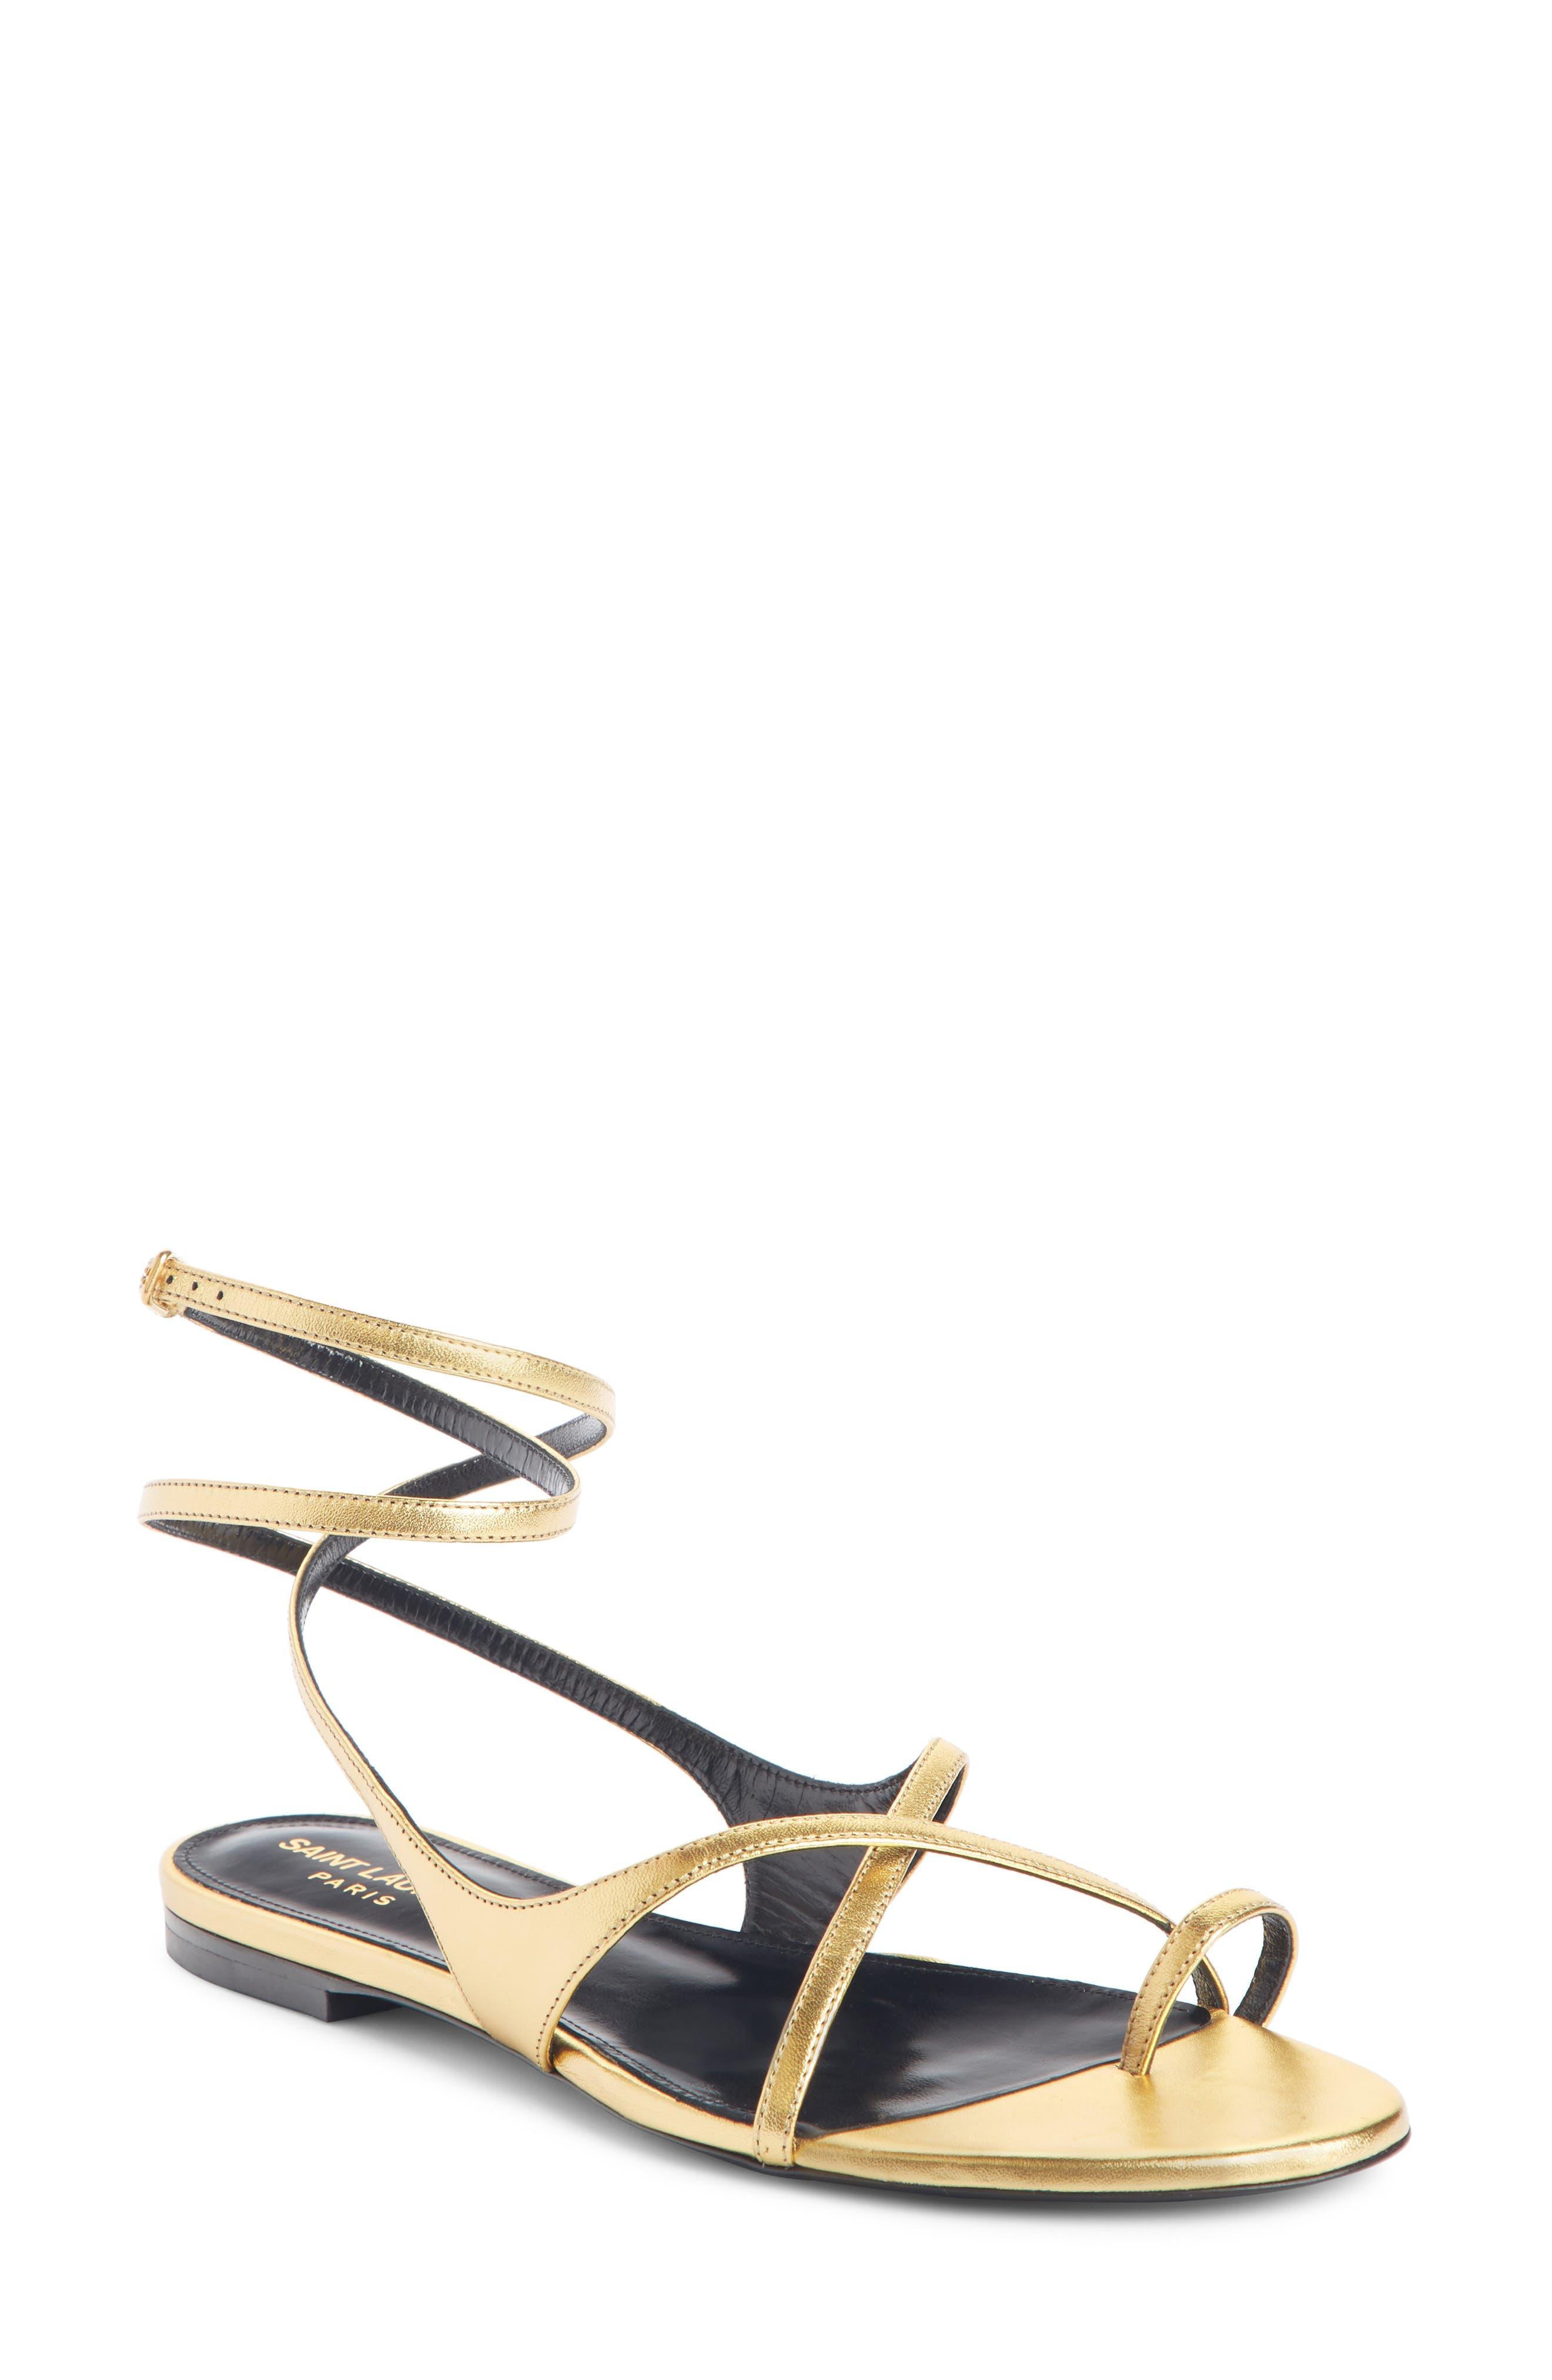 Saint Laurent Gia Nu Pieds Sandal, Metallic